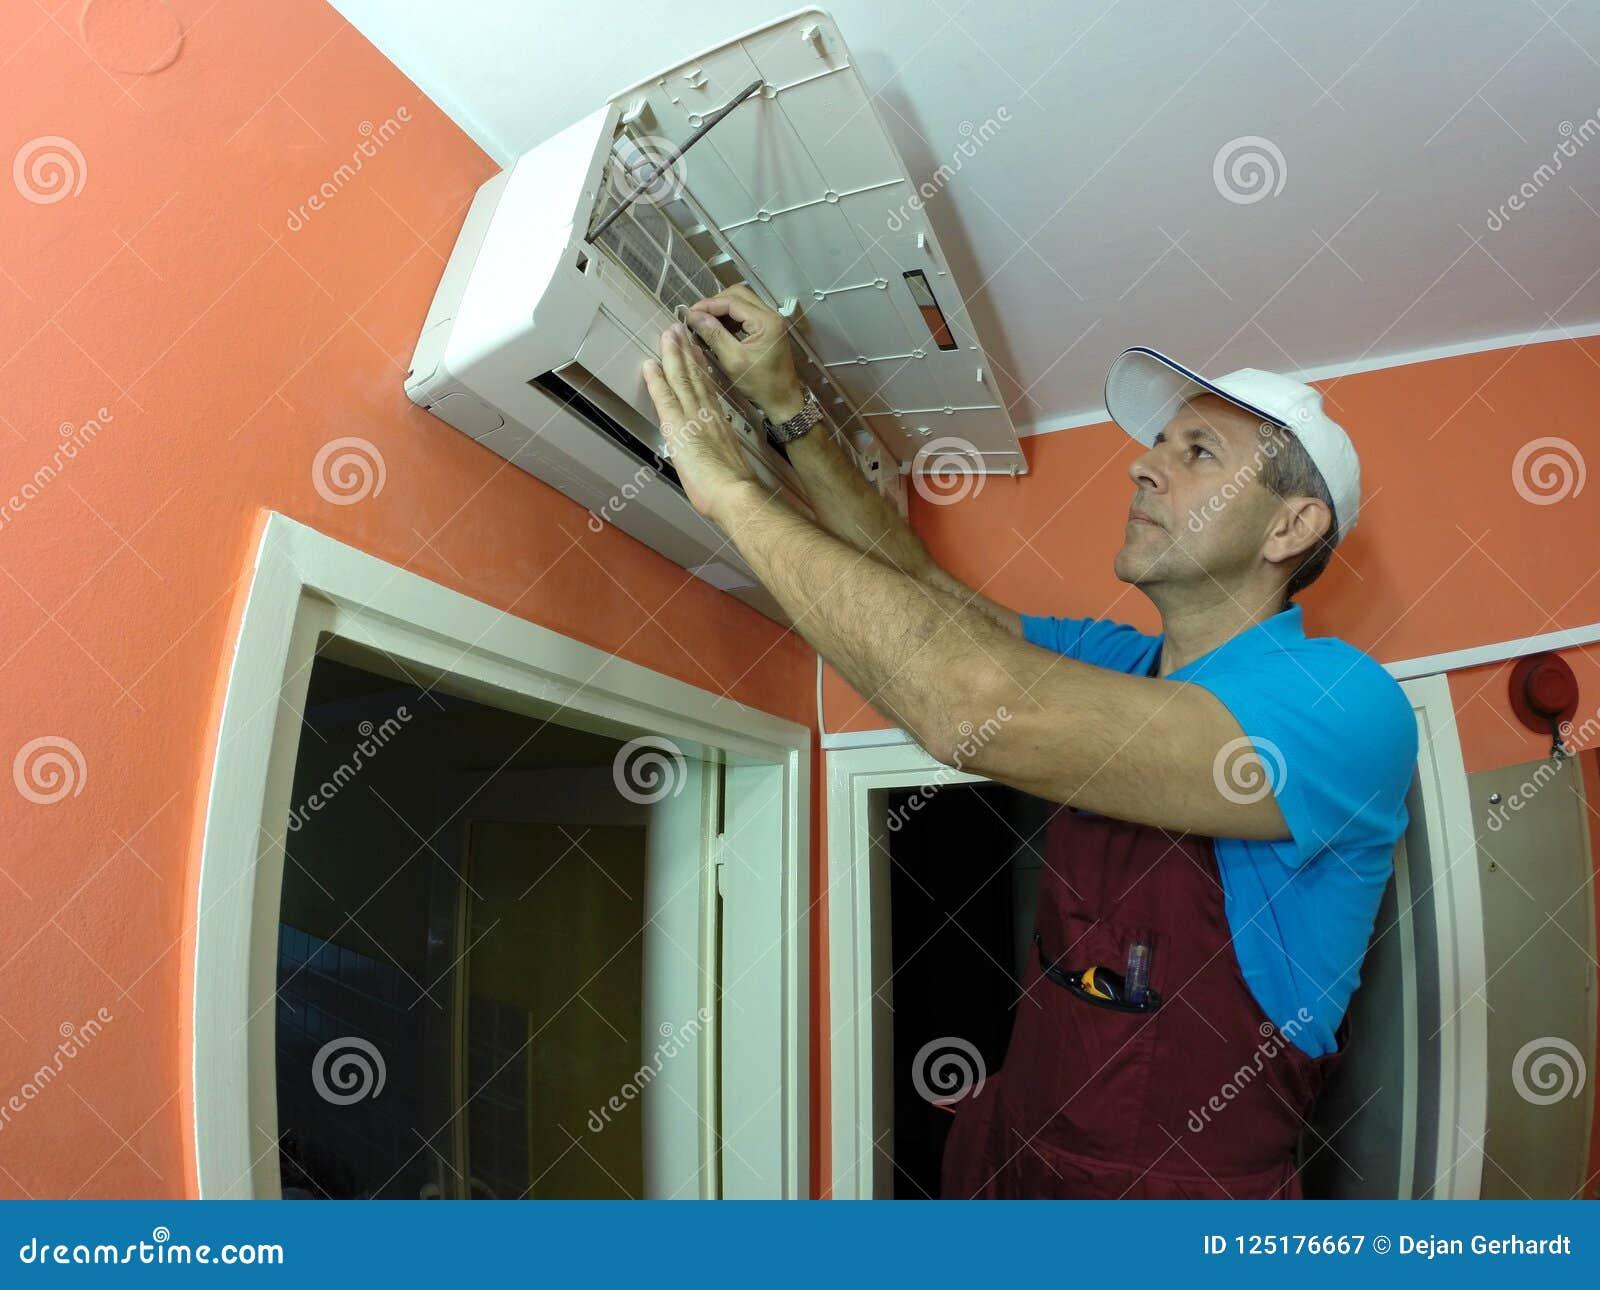 Tekniker Remove And Clean filtret av luft Conditione